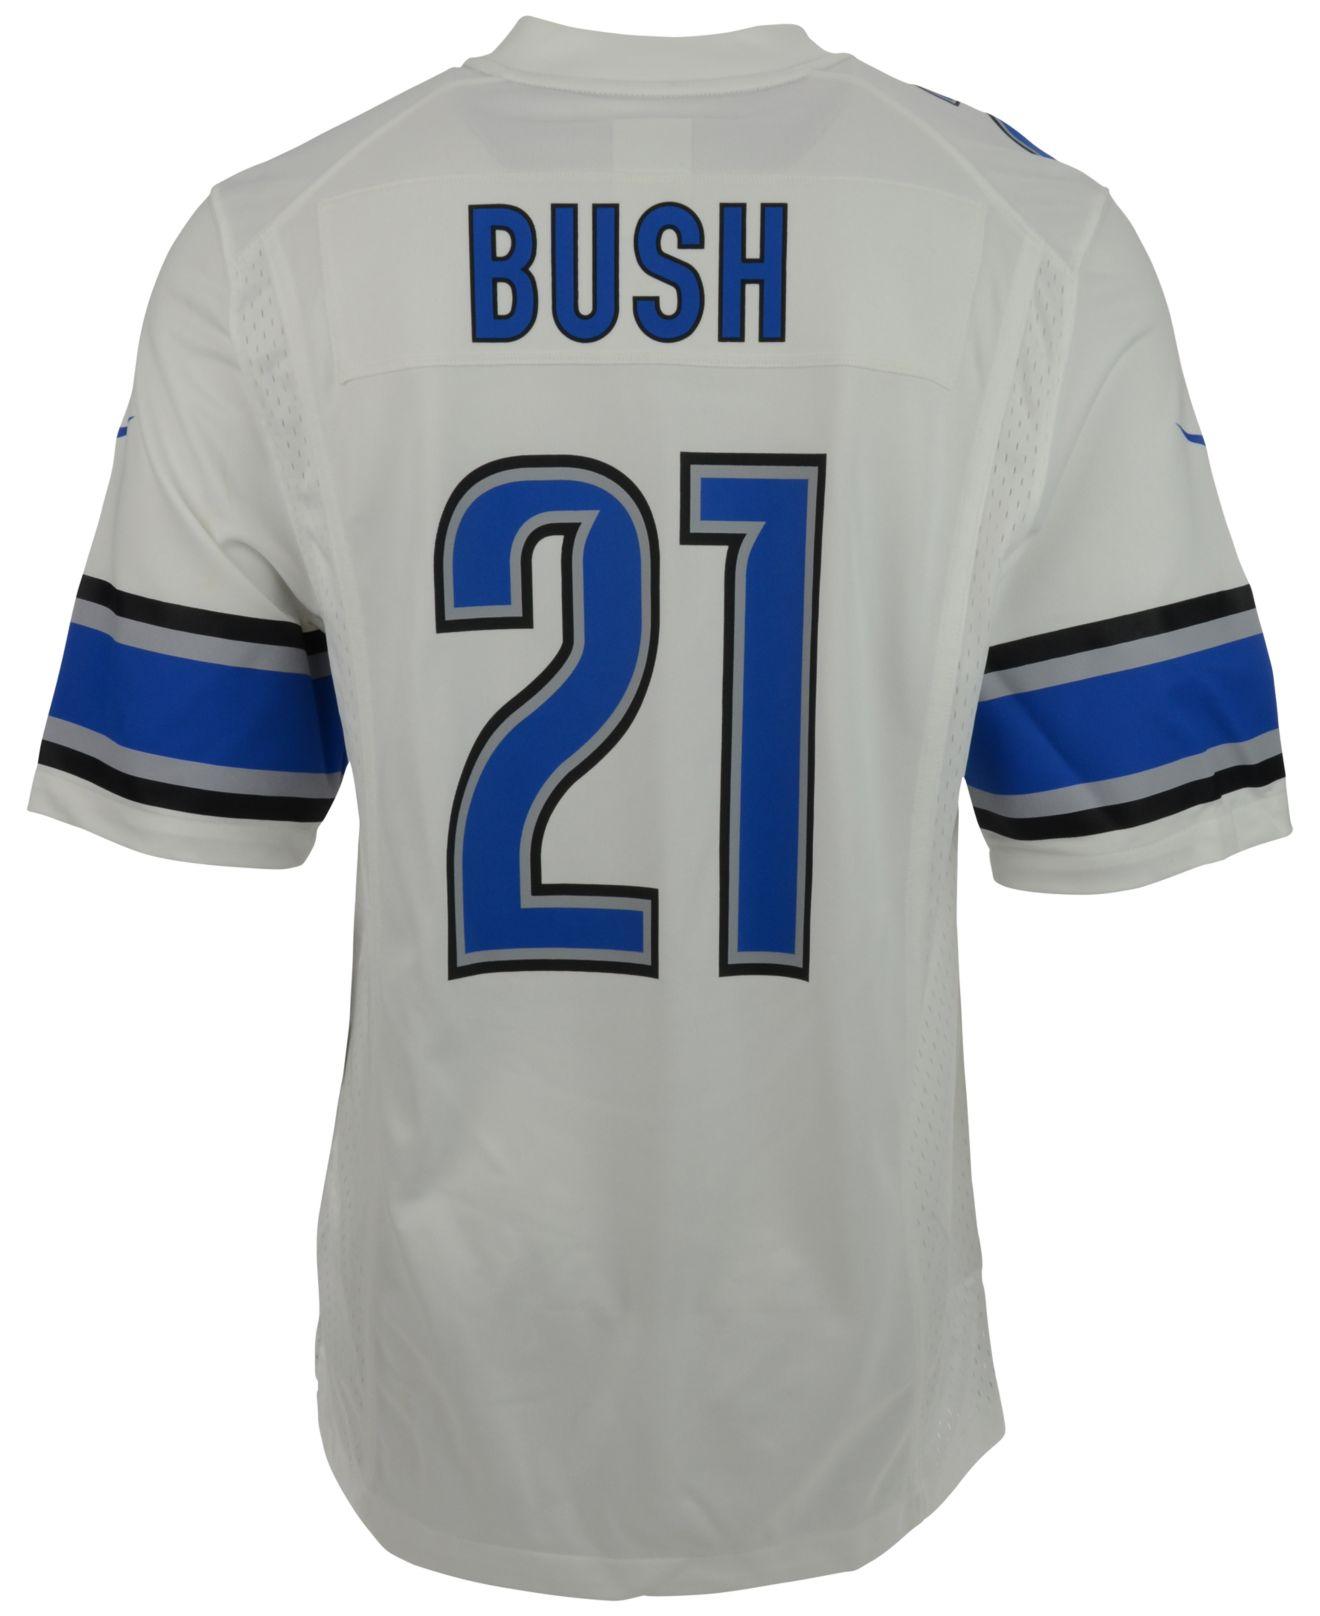 innovative design 44665 fc791 Lyst - Nike Men's Reggie Bush Detroit Lions Game Jersey in ...